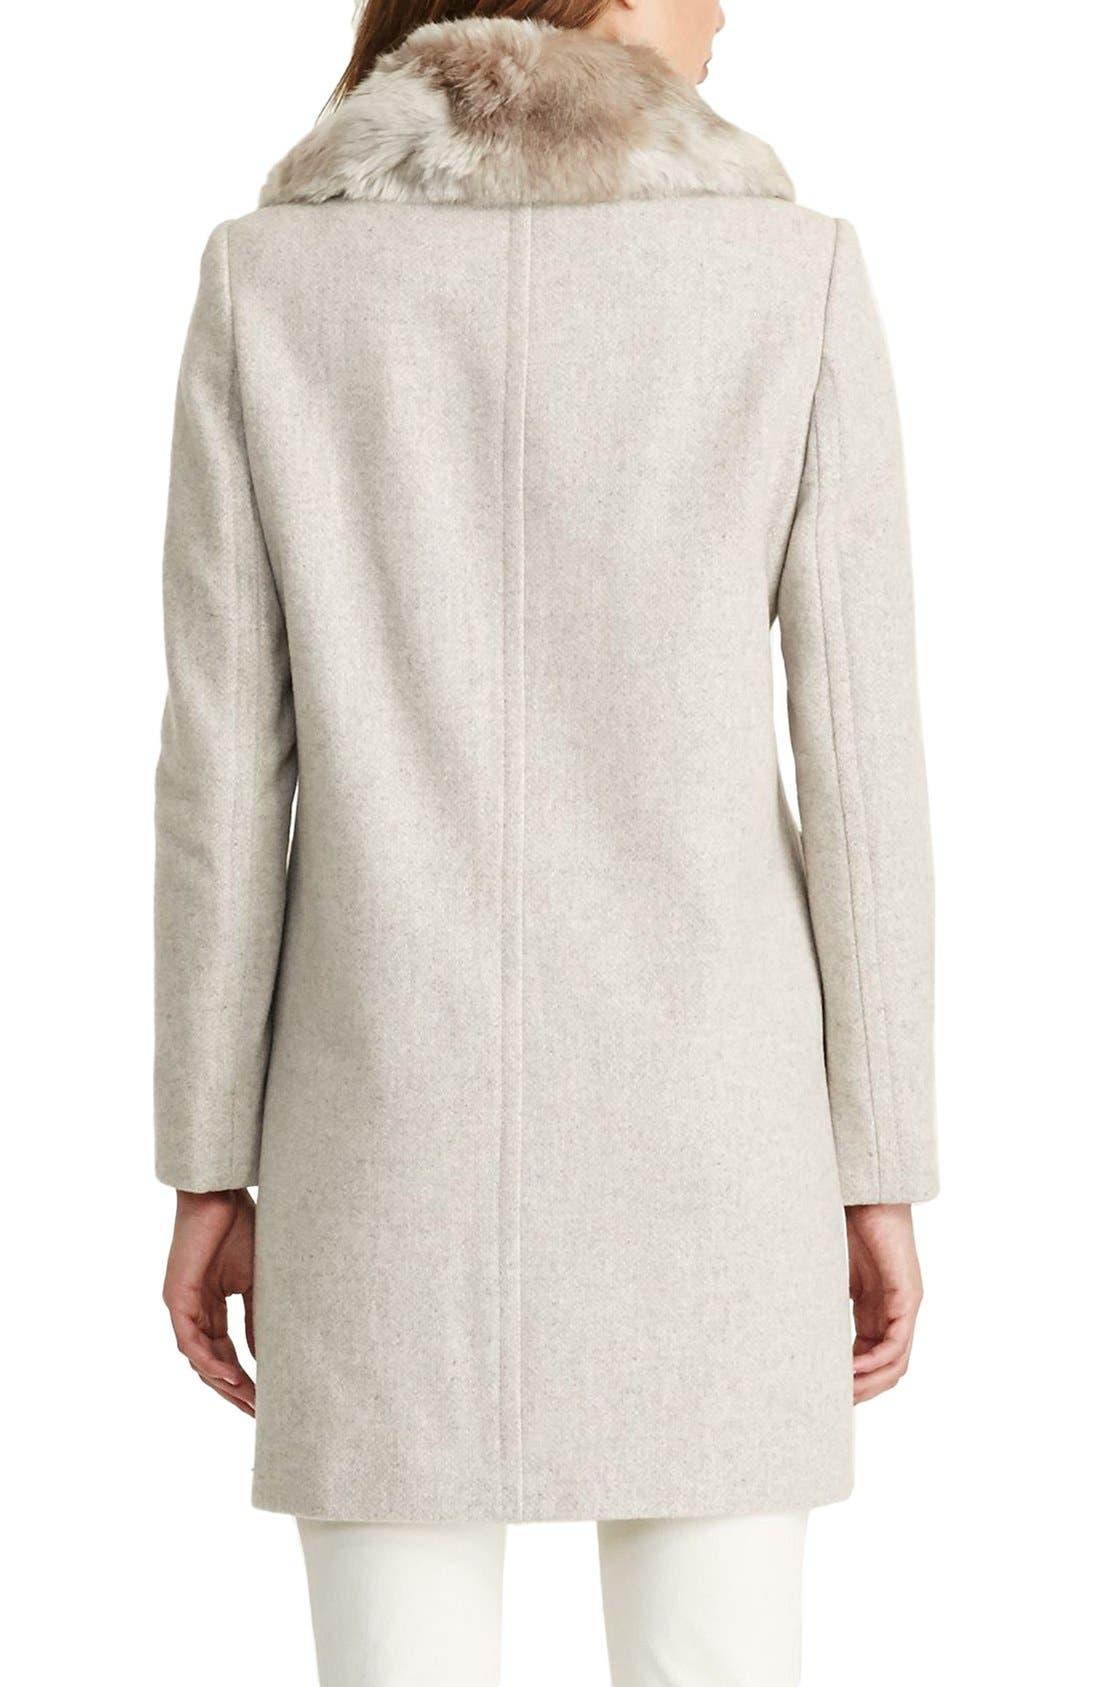 LAUREN RALPH LAUREN,                             Wool Blend Coat with Faux Fur Collar,                             Alternate thumbnail 3, color,                             068